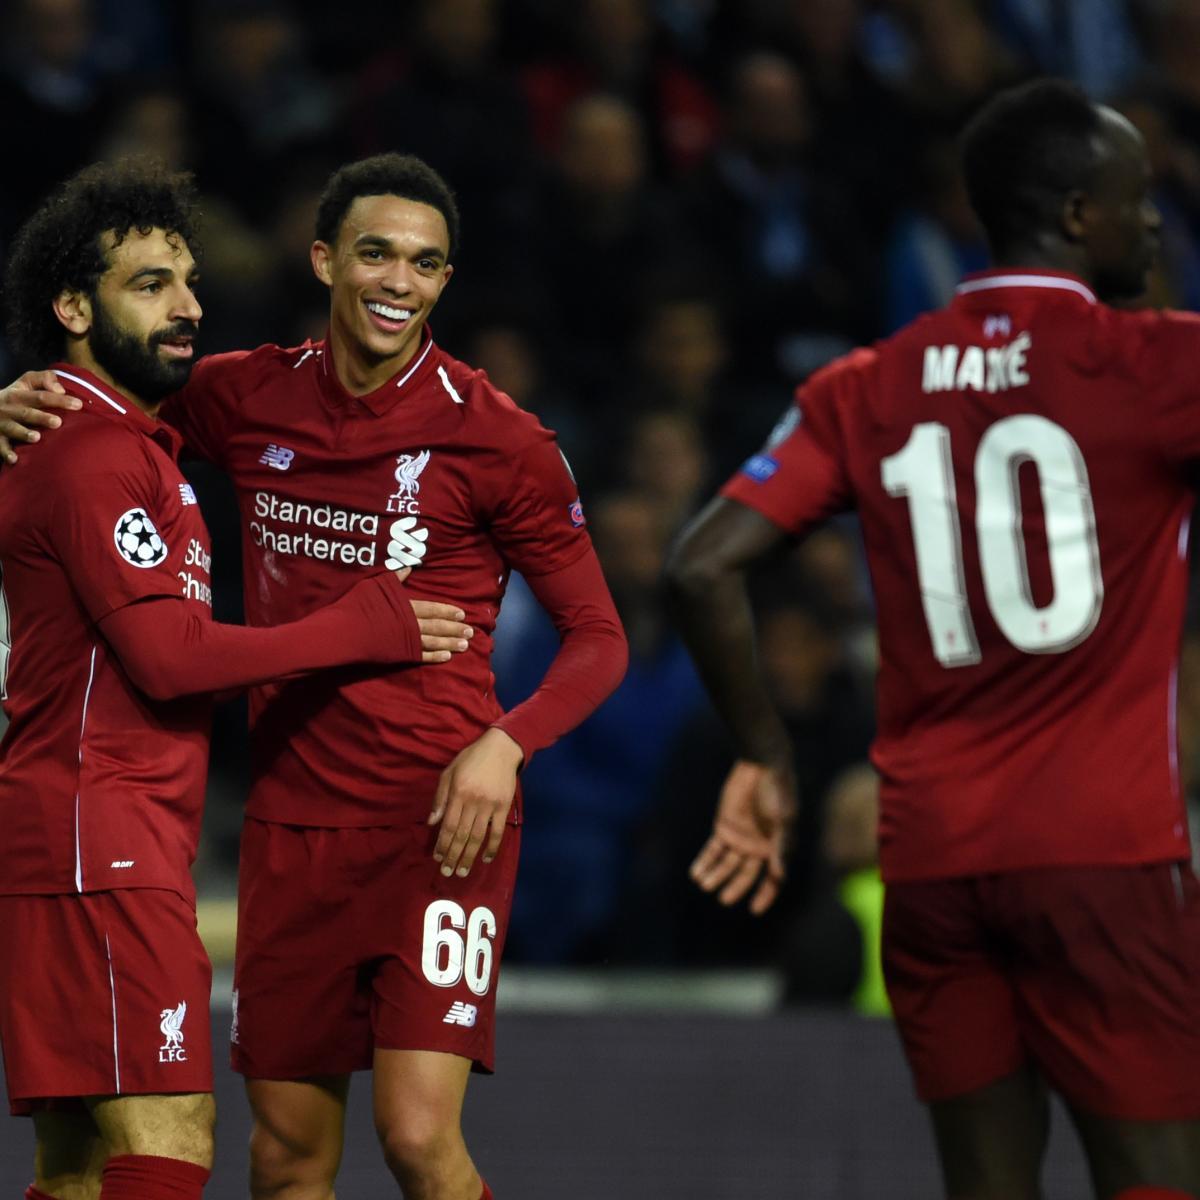 Champions League 2019 Round Of 16 Leg 2 Live Stream Tv: Barcelona Vs. Liverpool: Odds, Live Stream, TV Info For